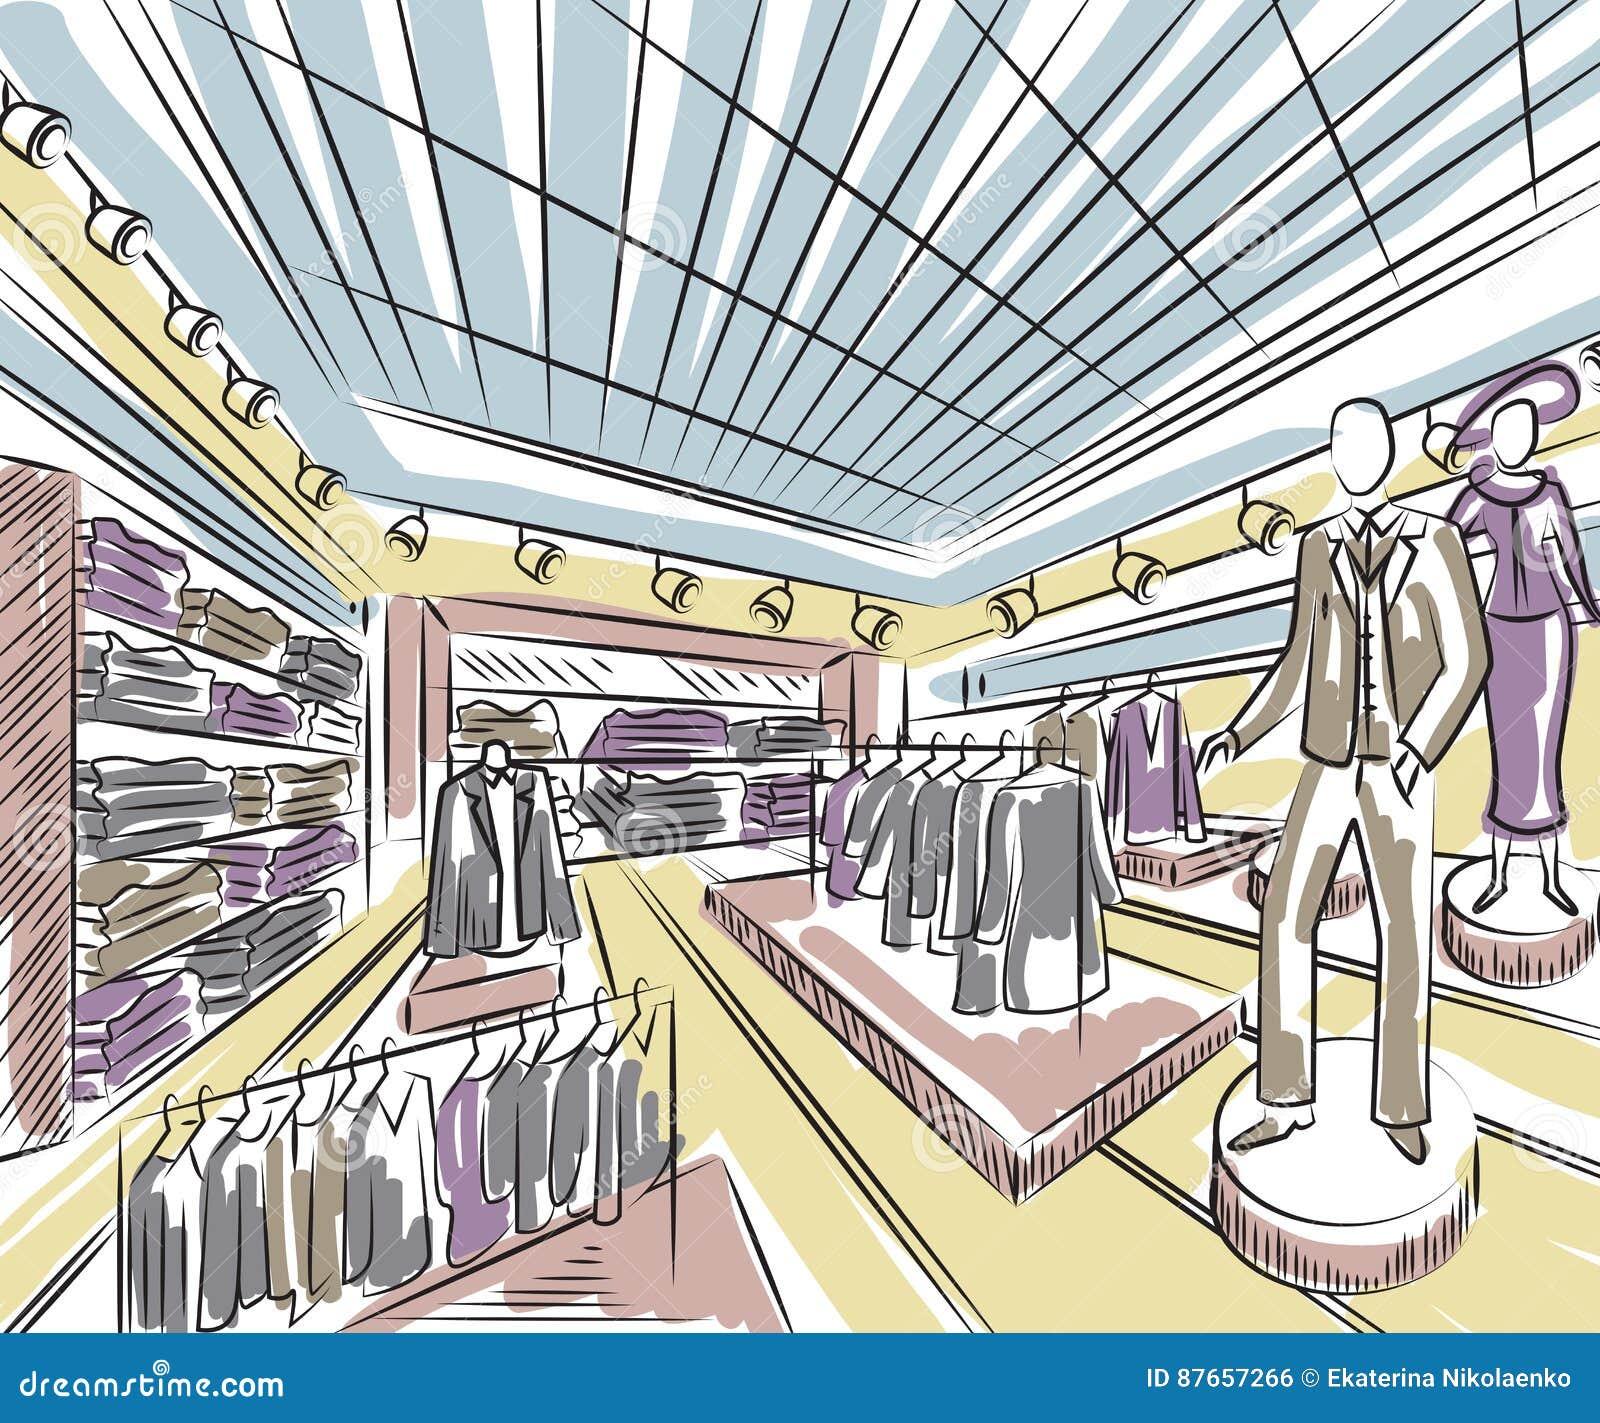 Fashion Store Interior Design In Sketch Style Stock Vector Image 87657266